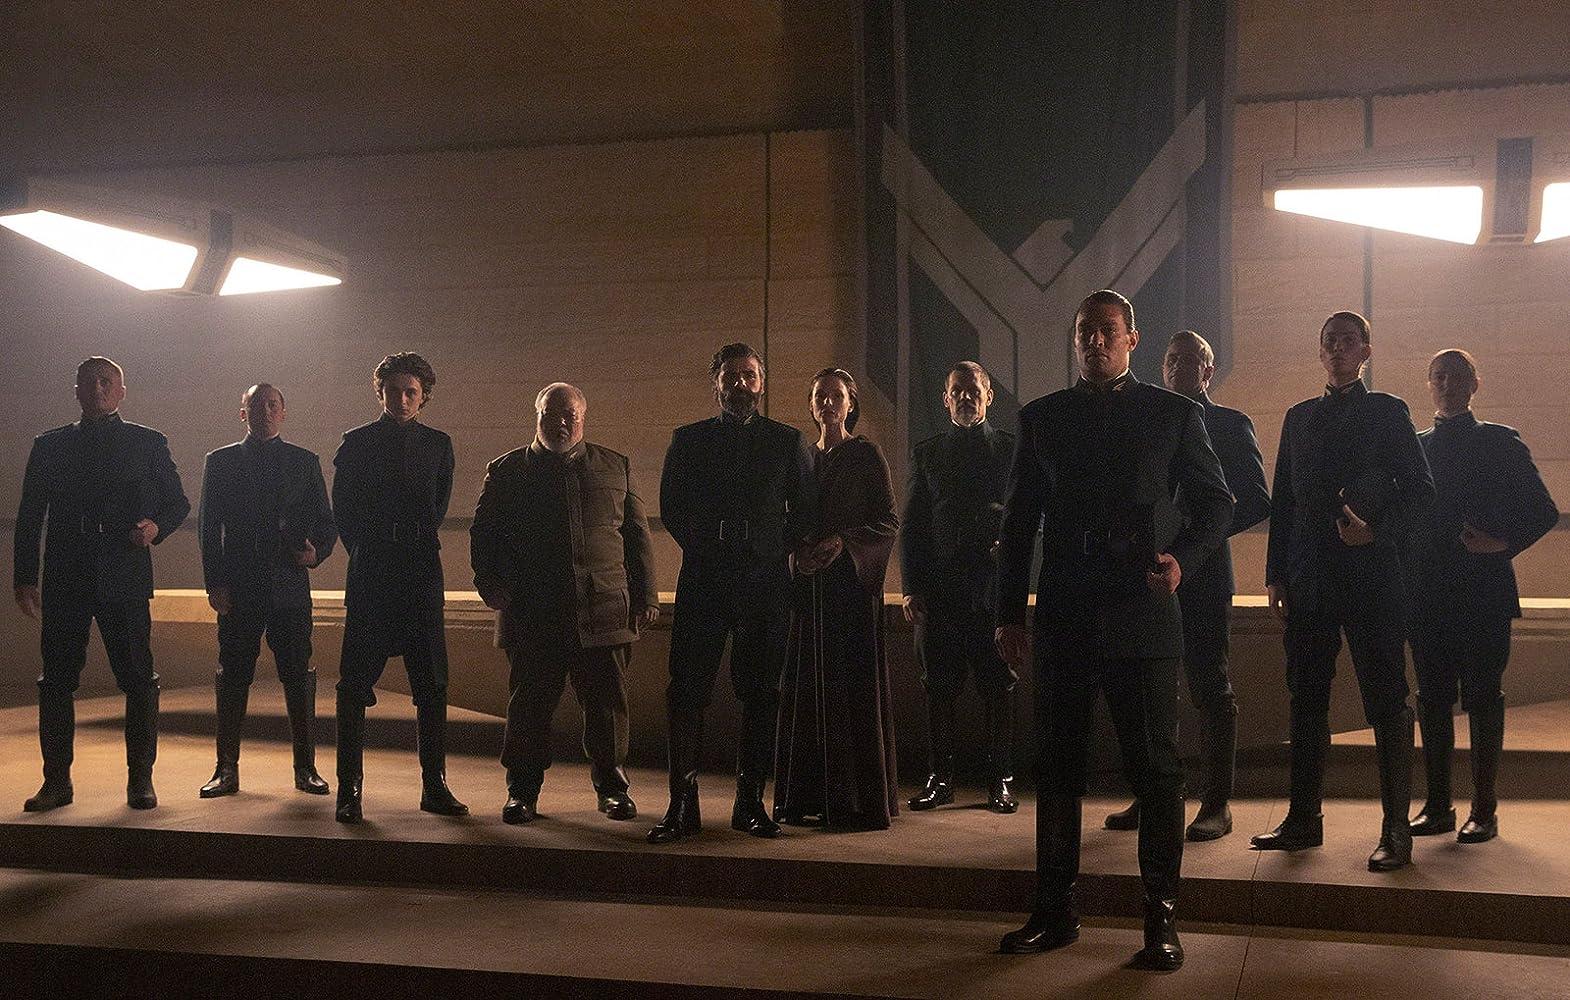 Josh Brolin, Rebecca Ferguson, Stephen McKinley Henderson, Jason Momoa, Oscar Isaac, and Timothée Chalamet in Dune (2020)